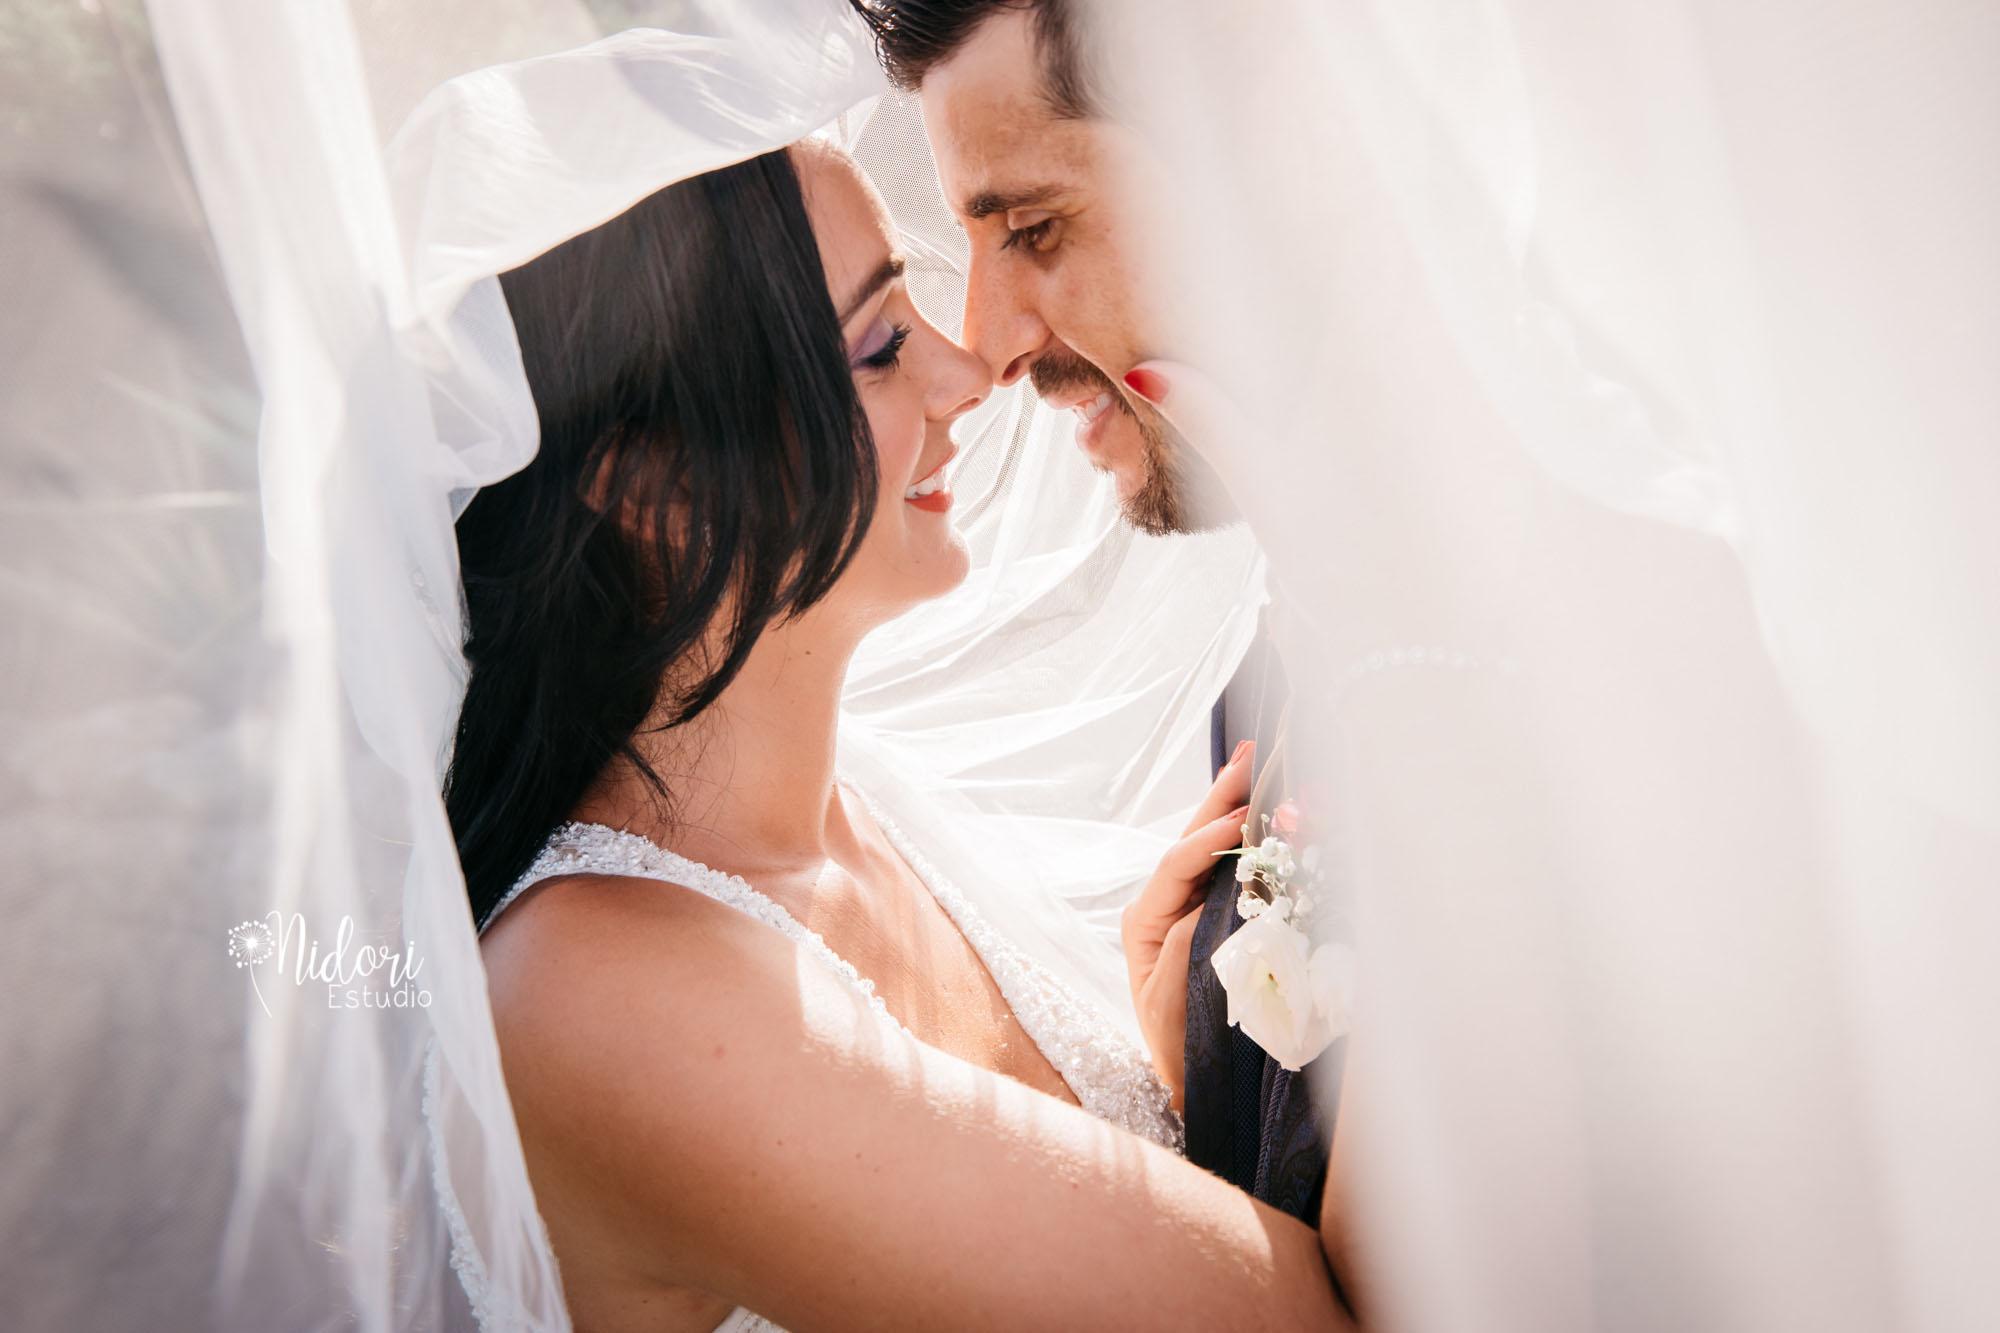 fotos-de-boda-reportaje-novios-fotografia-boda-nidoriestudio-fotos-valencia-almazora-castellon-españa-spain-064